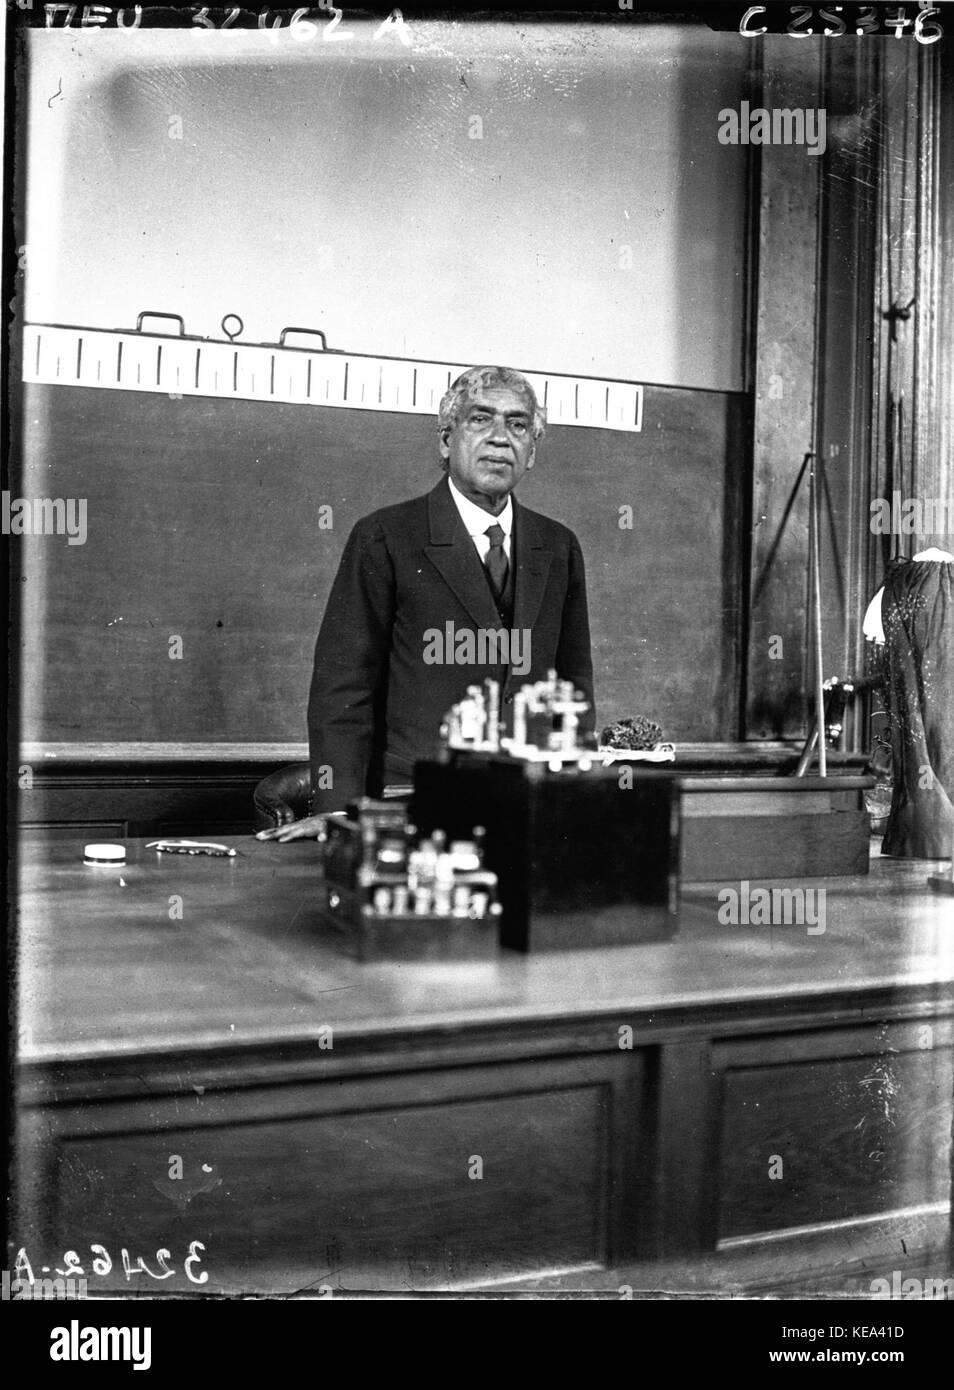 Jagadish Chandra Bose 1926 full image - Stock Image